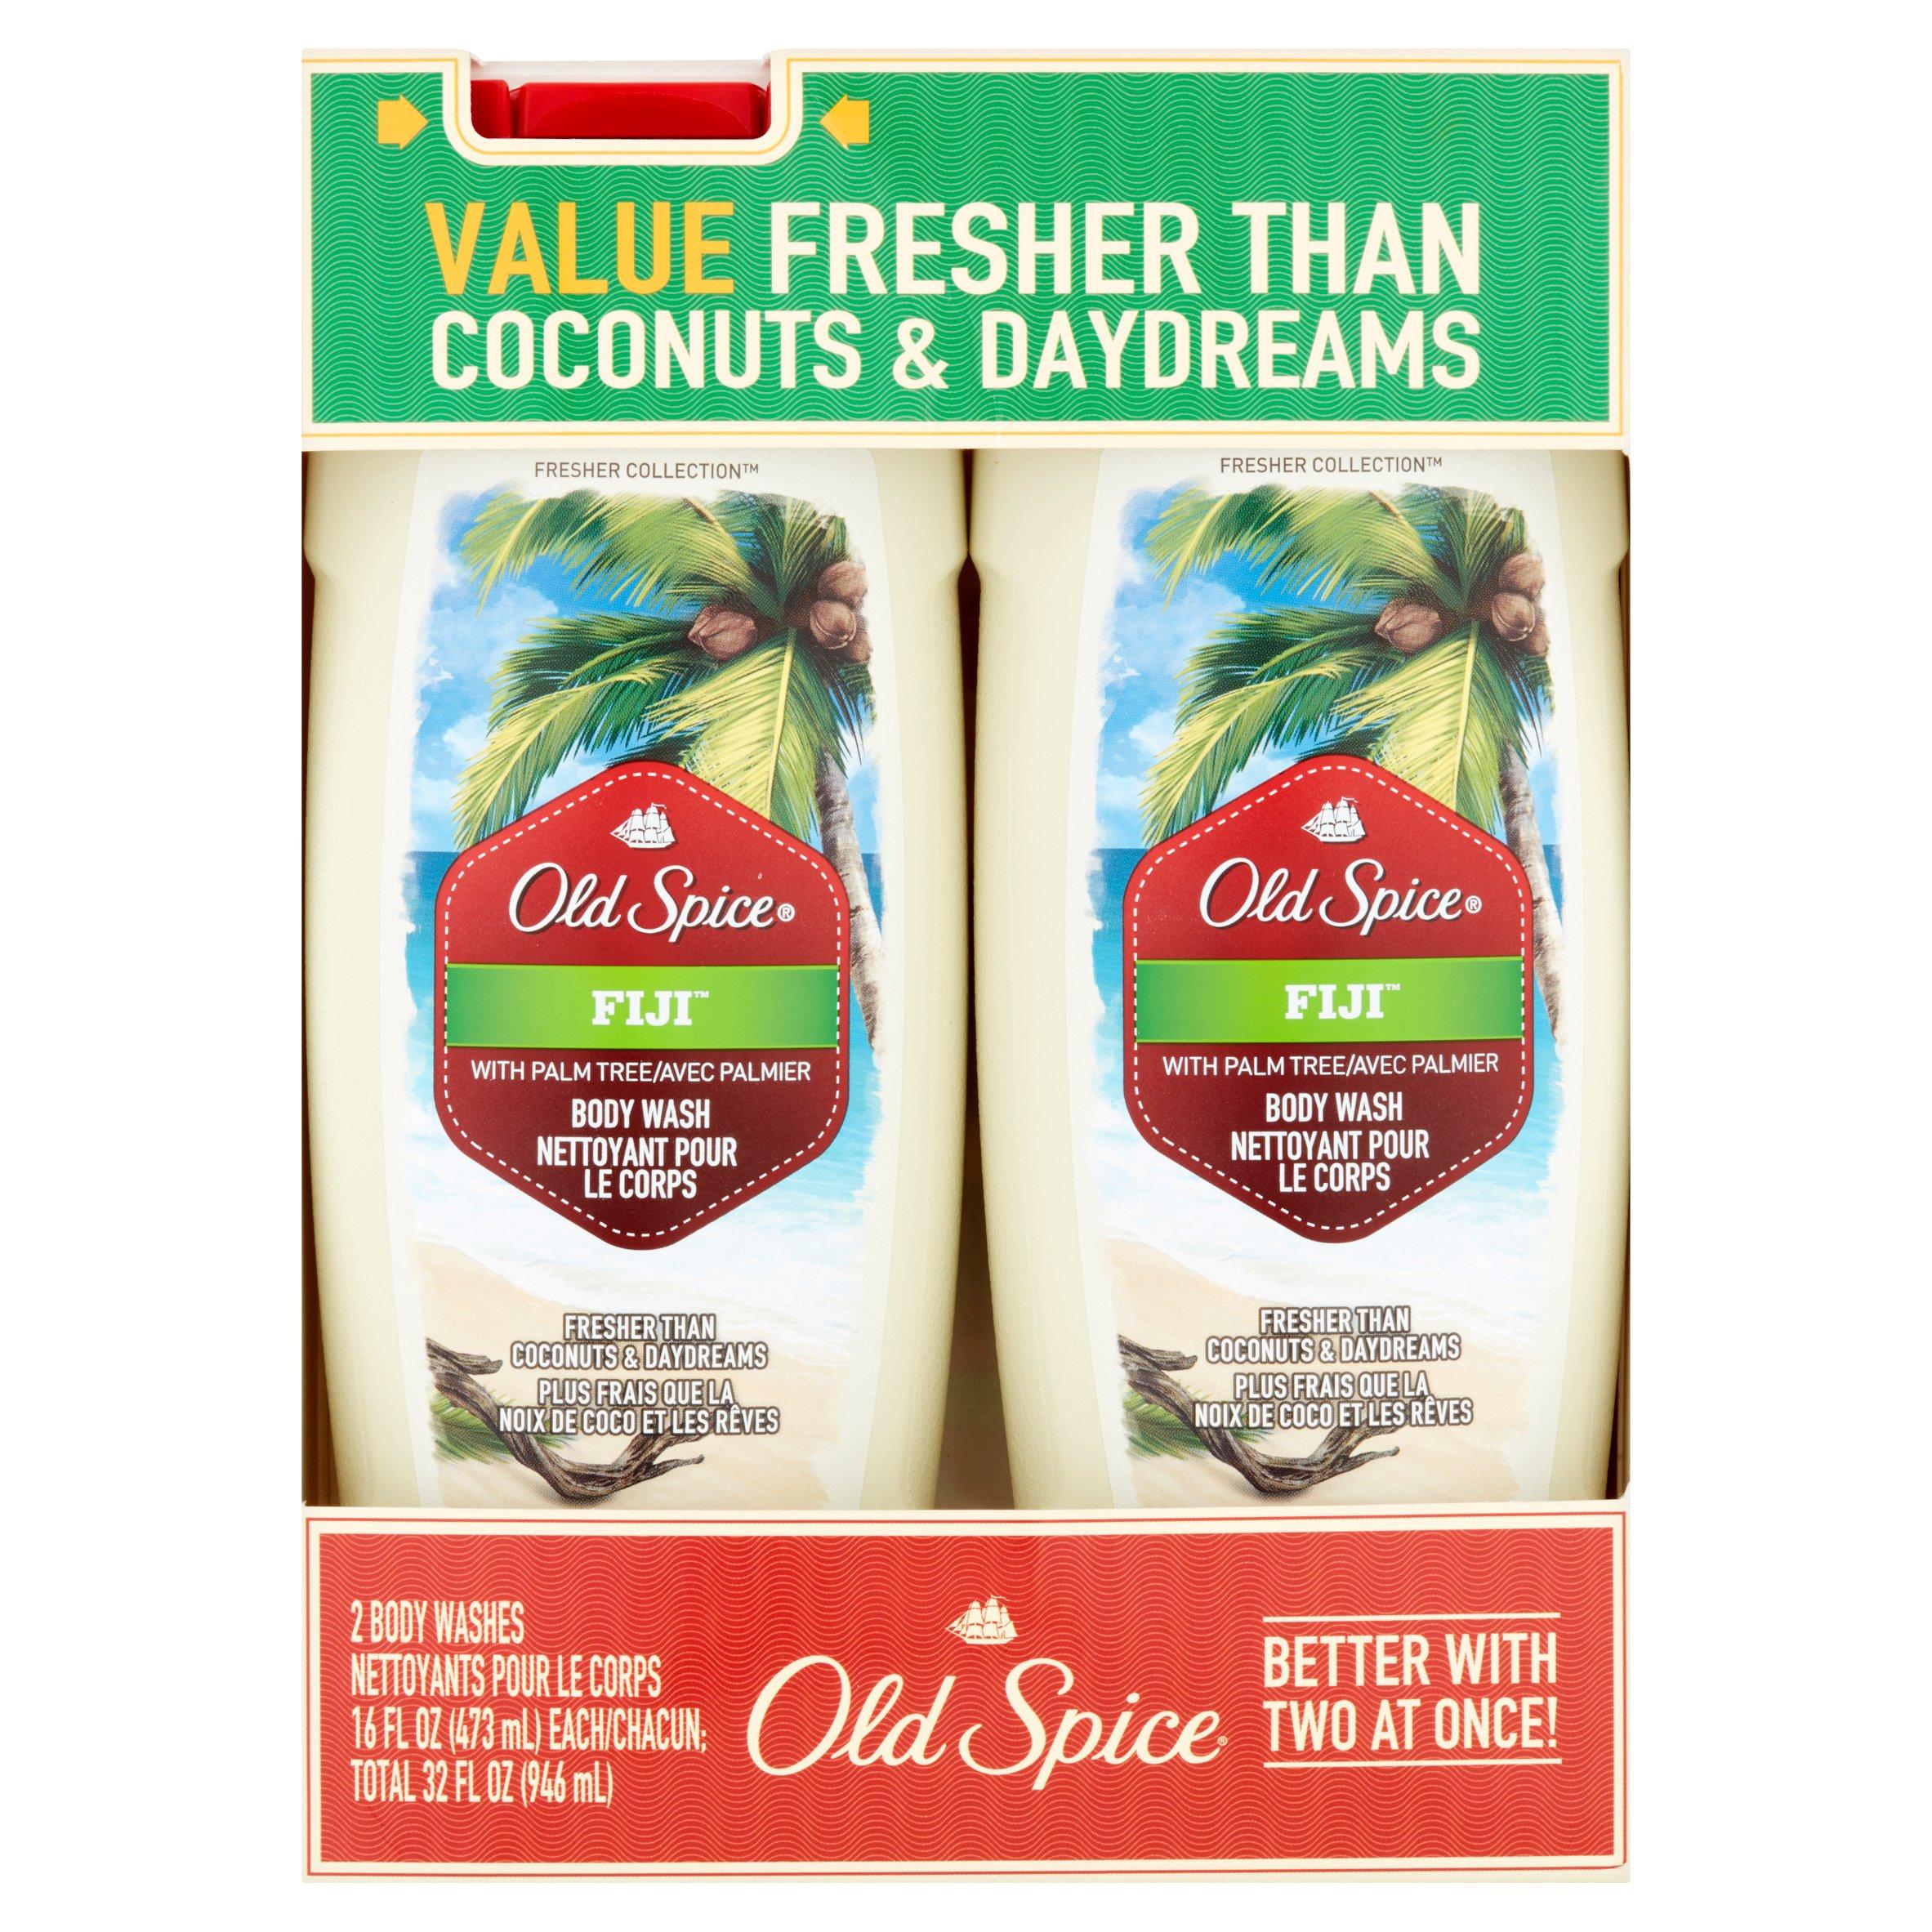 Old Spice Fiji Body Wash, 16 fl oz, 2 count